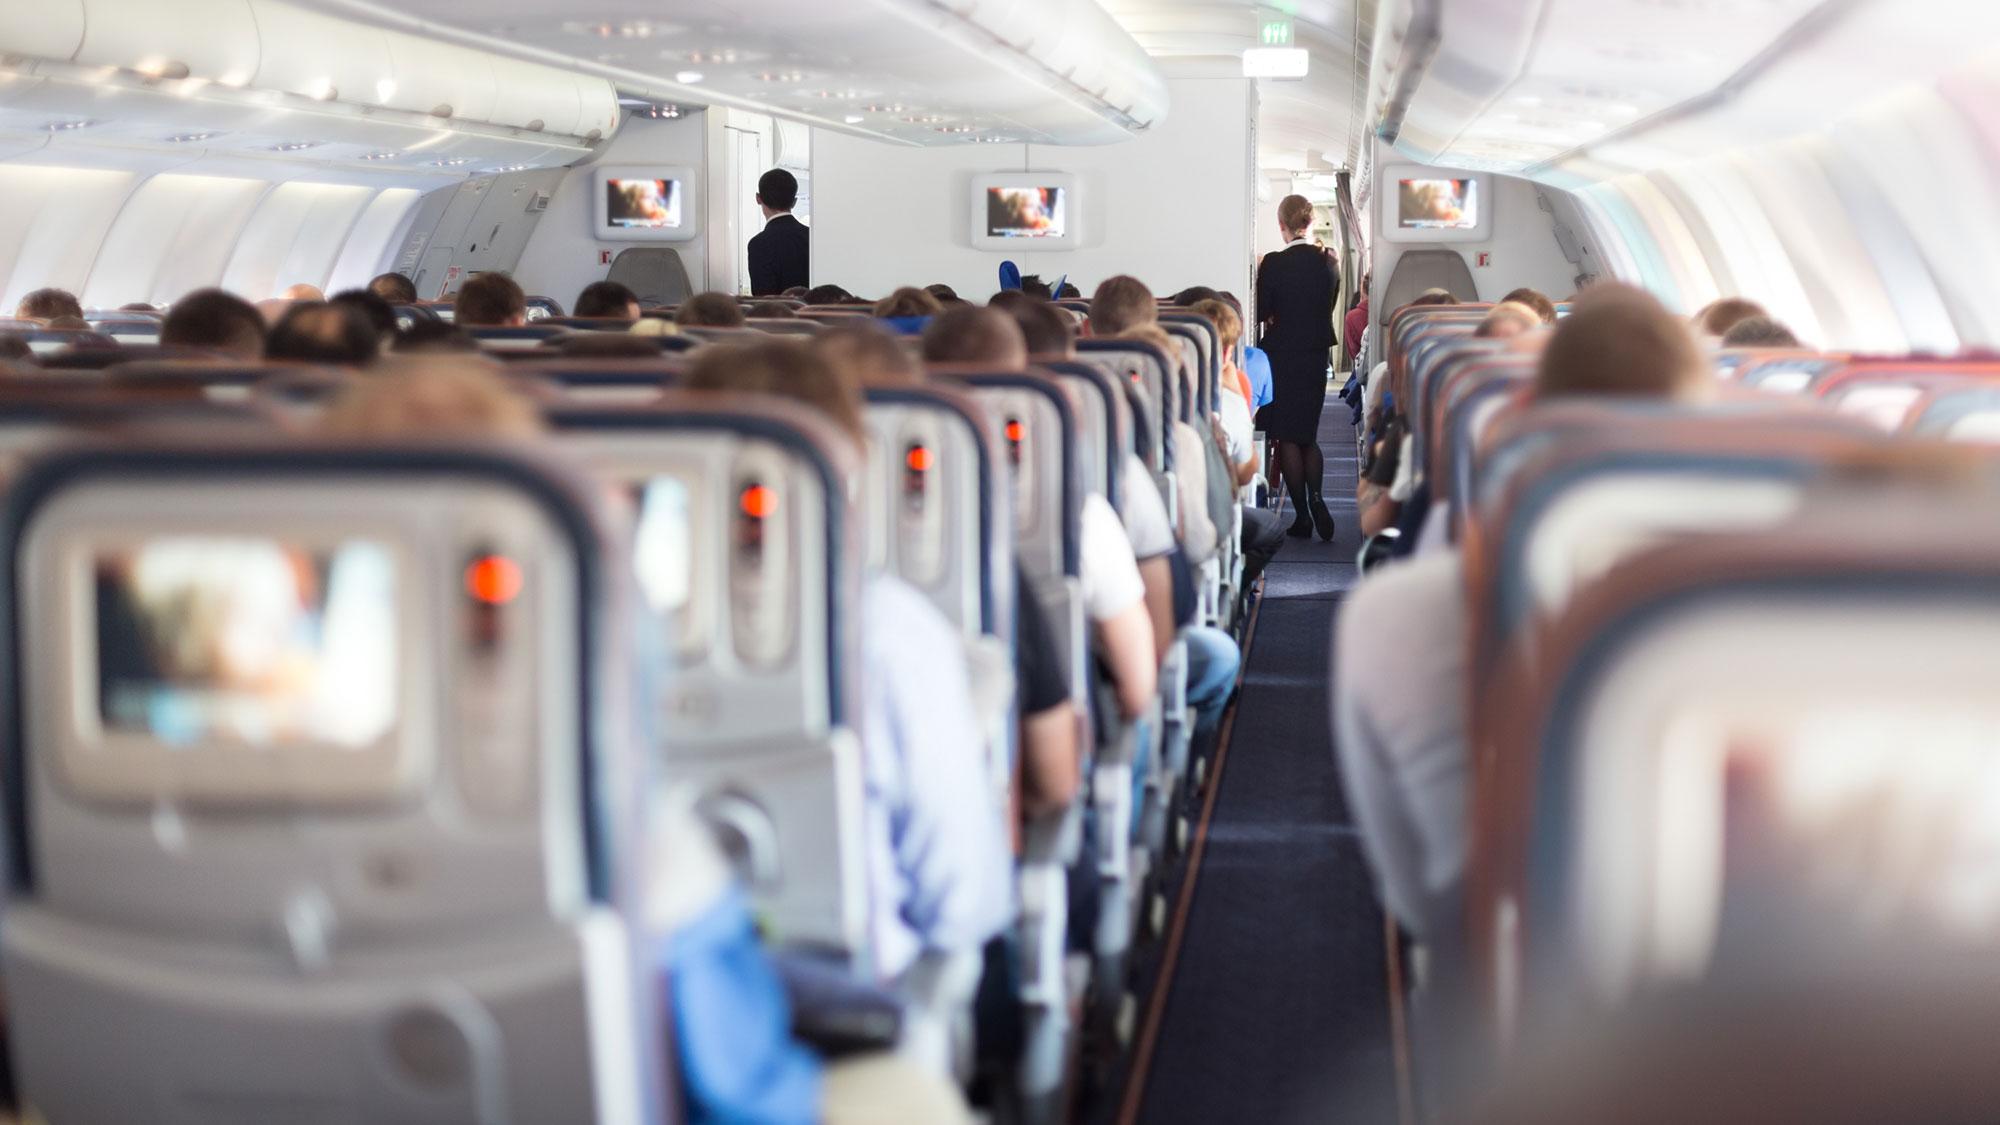 Resultado de imagen para FAA size seat aircraft